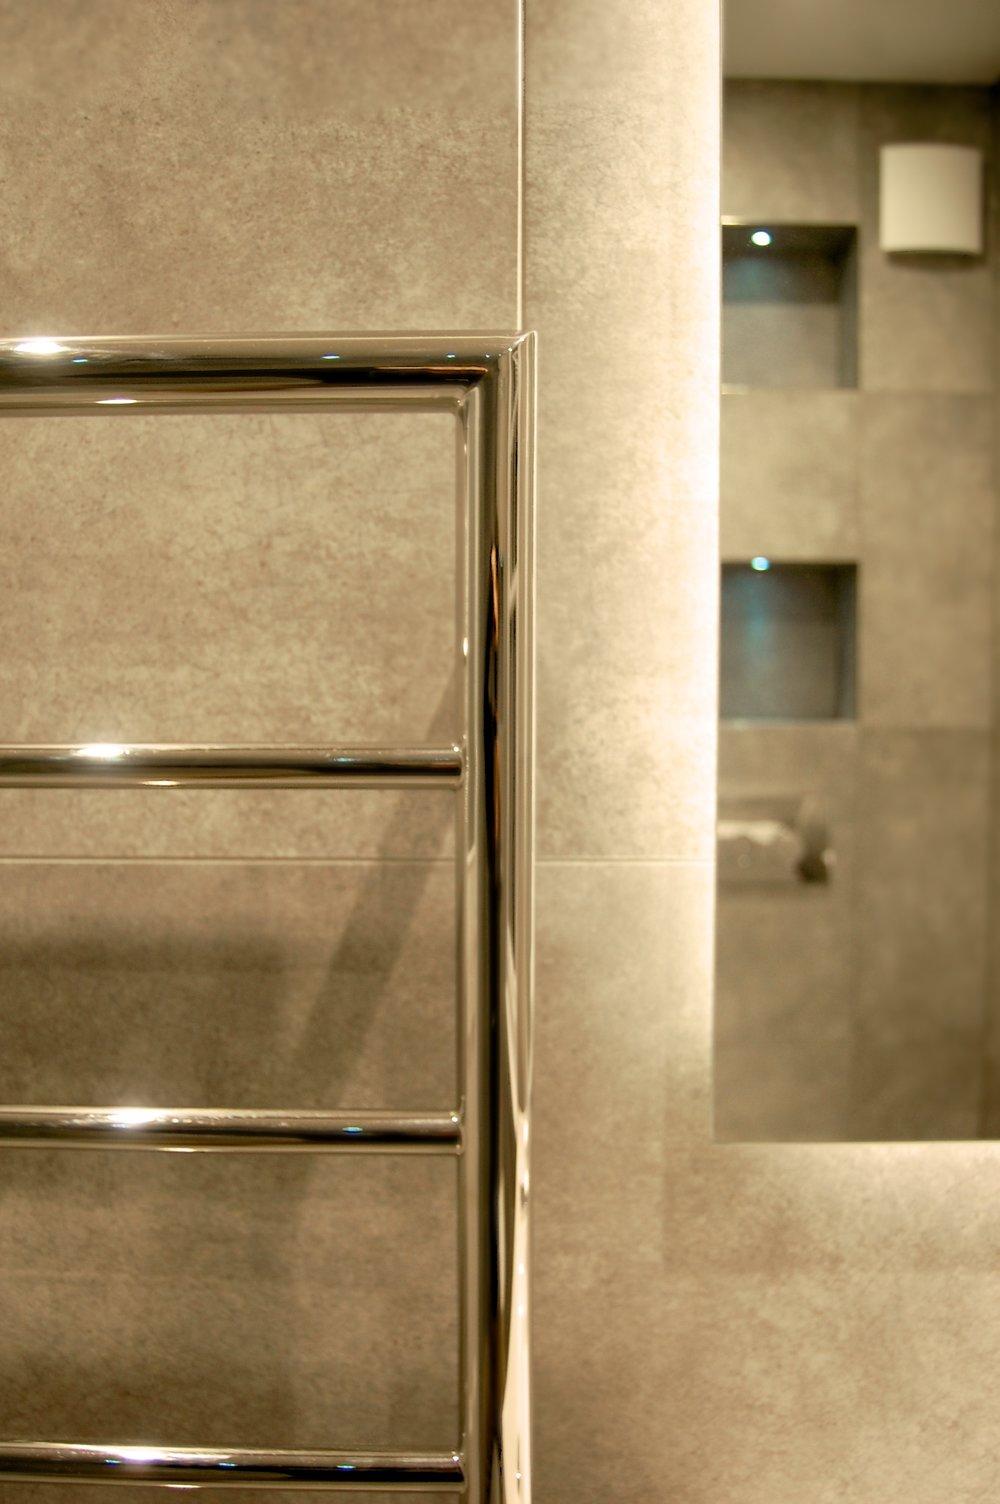 Retreat Bathrooms Bathroom Design, Refurbishment, Supply & Installation Teddington, Richmond 767.jpg